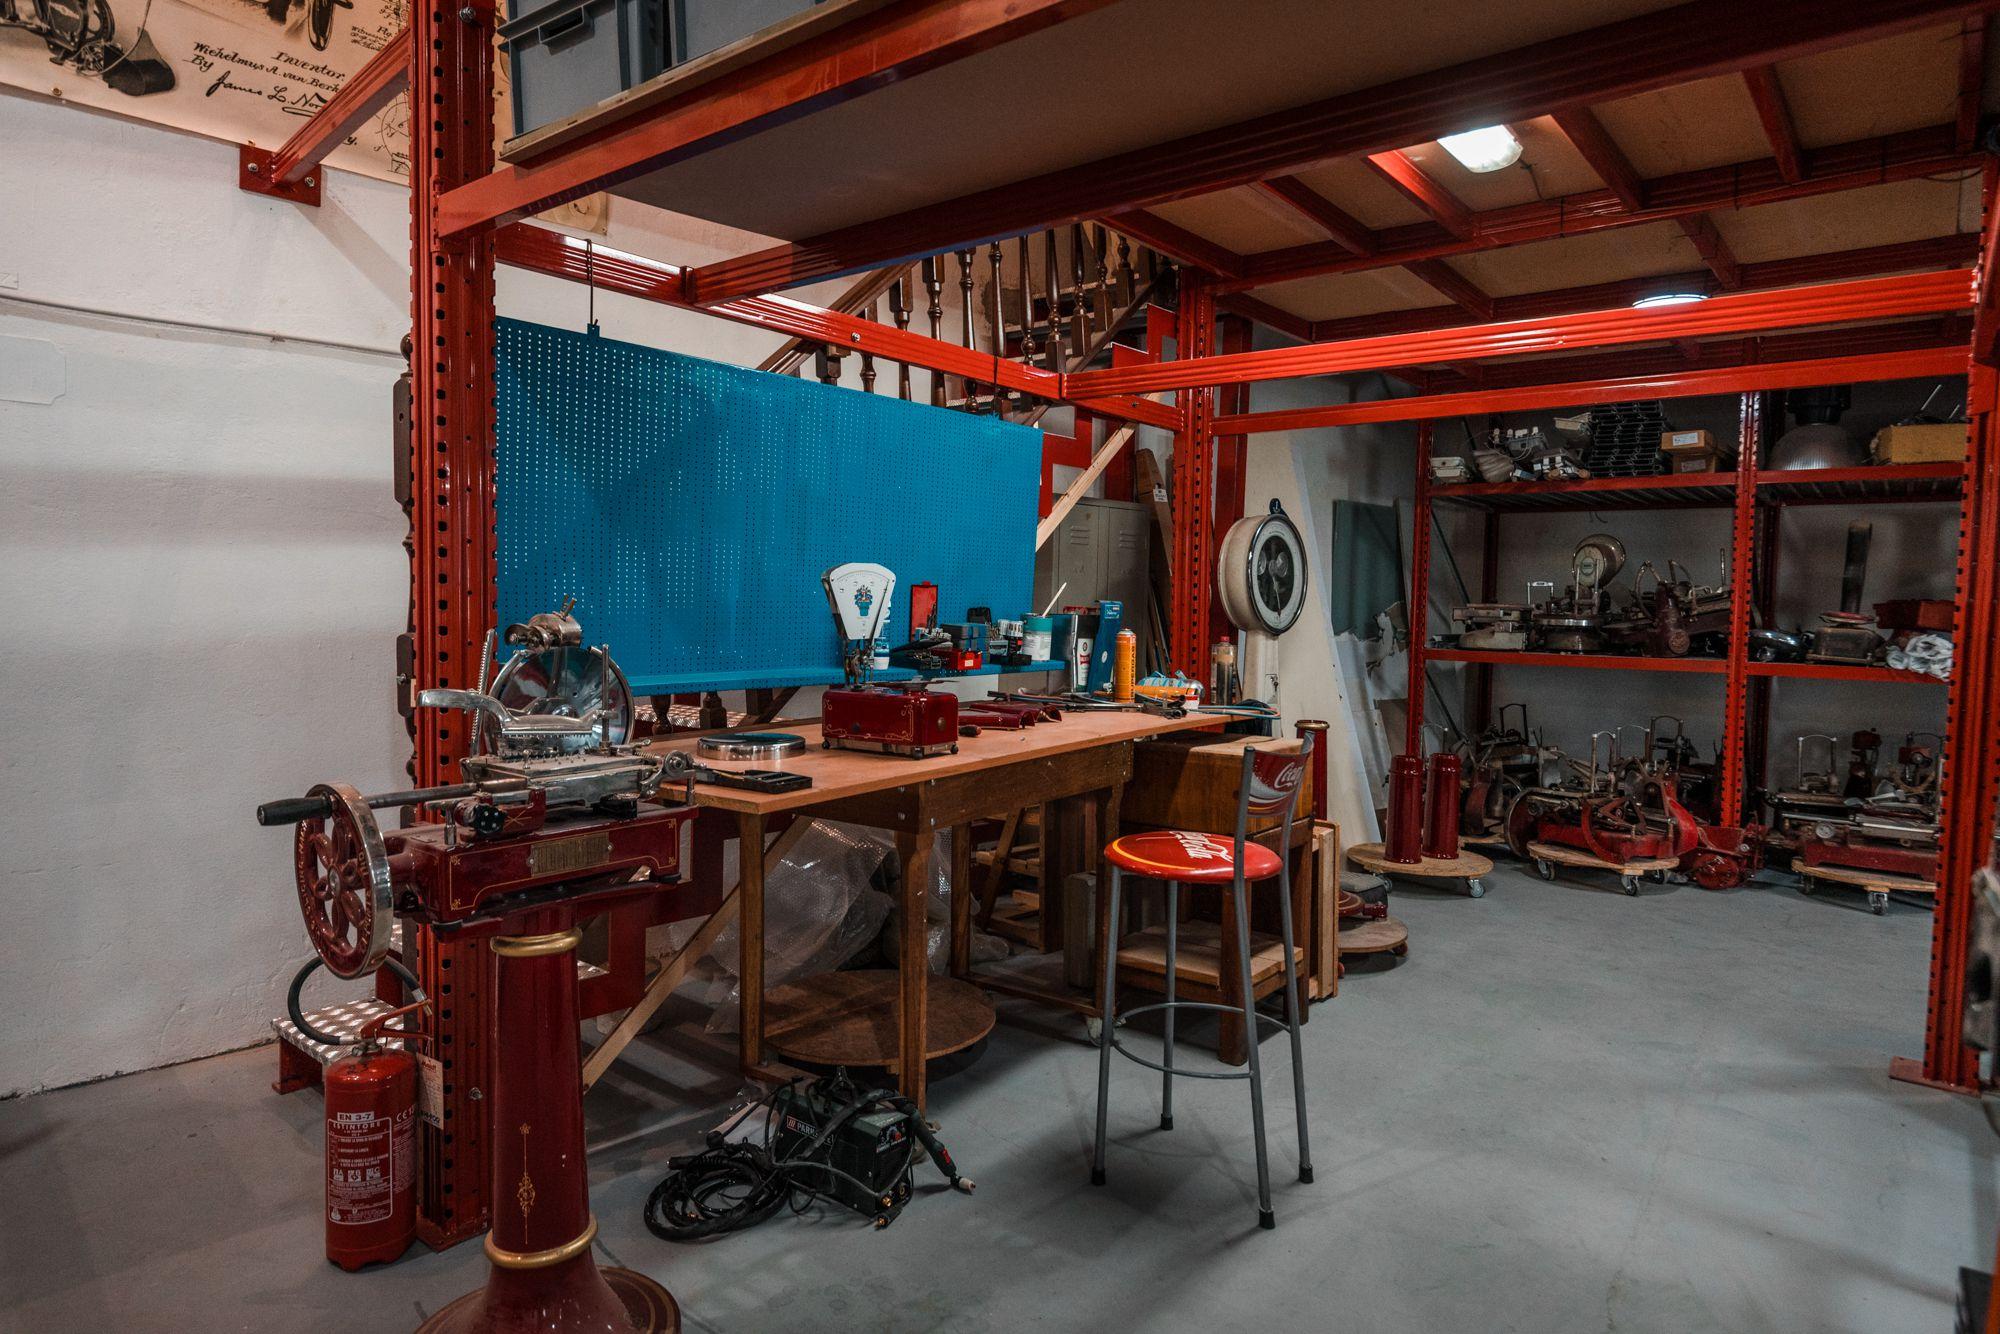 , Laboratorio di restauro Berkel, Affettetrici Berkel | Restauro e Vendita